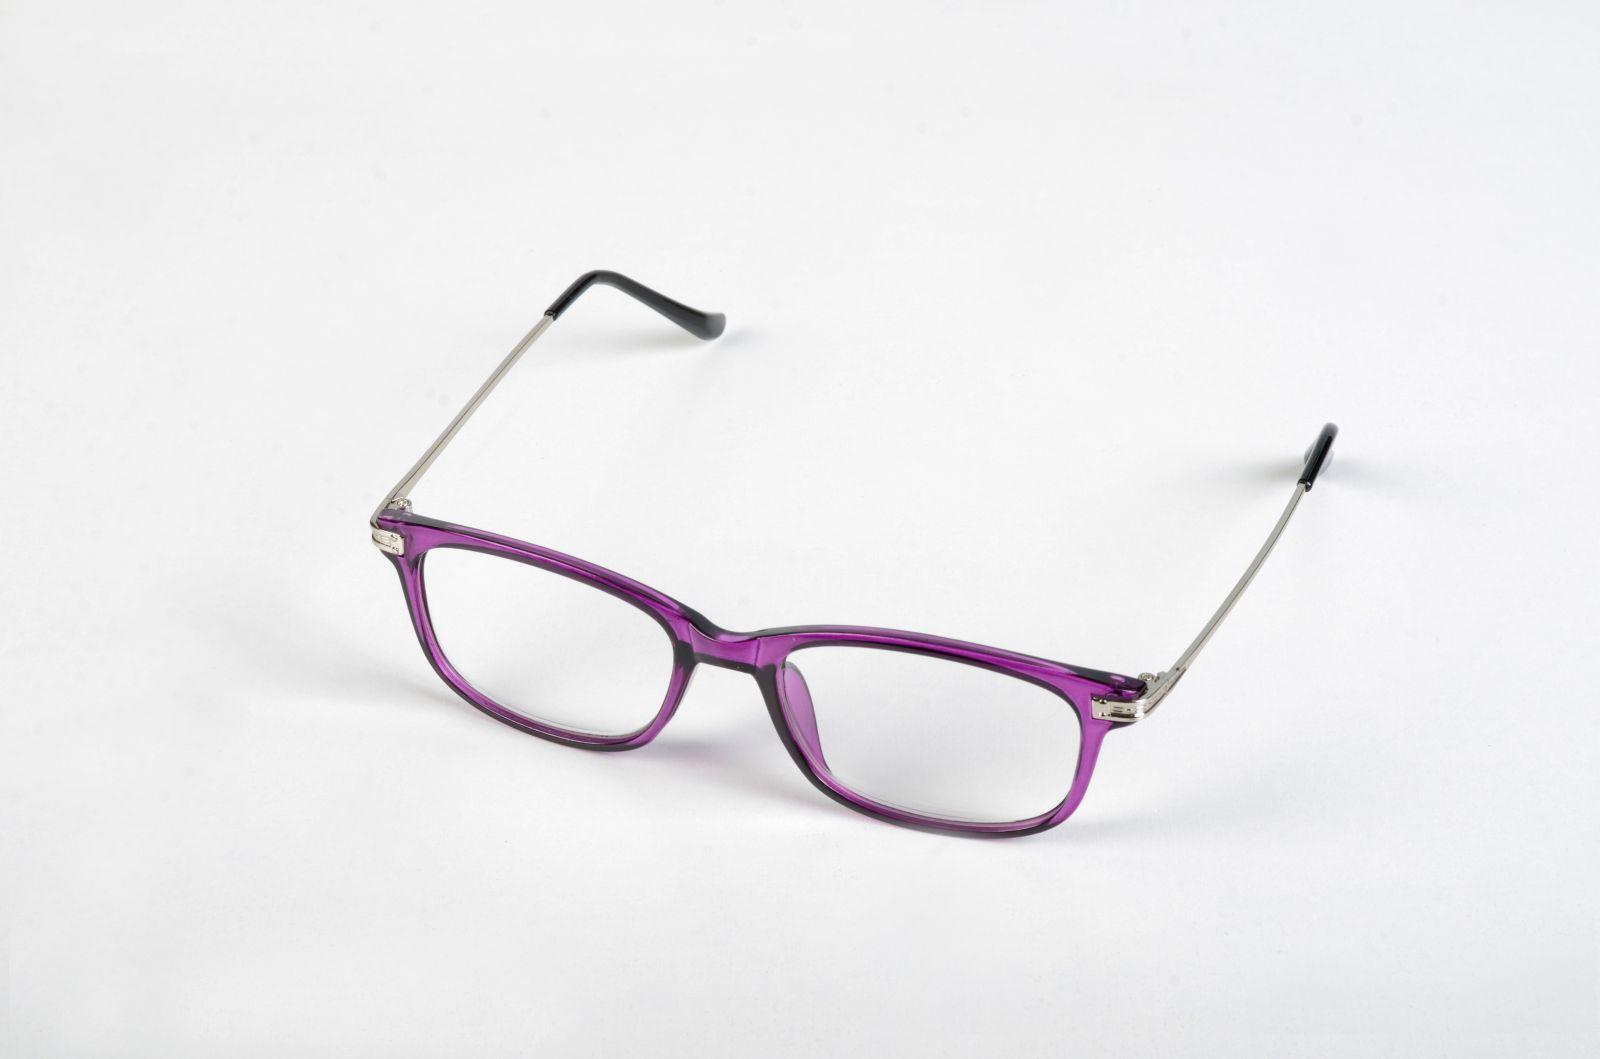 Dioptrické brýle 1807 +1,50